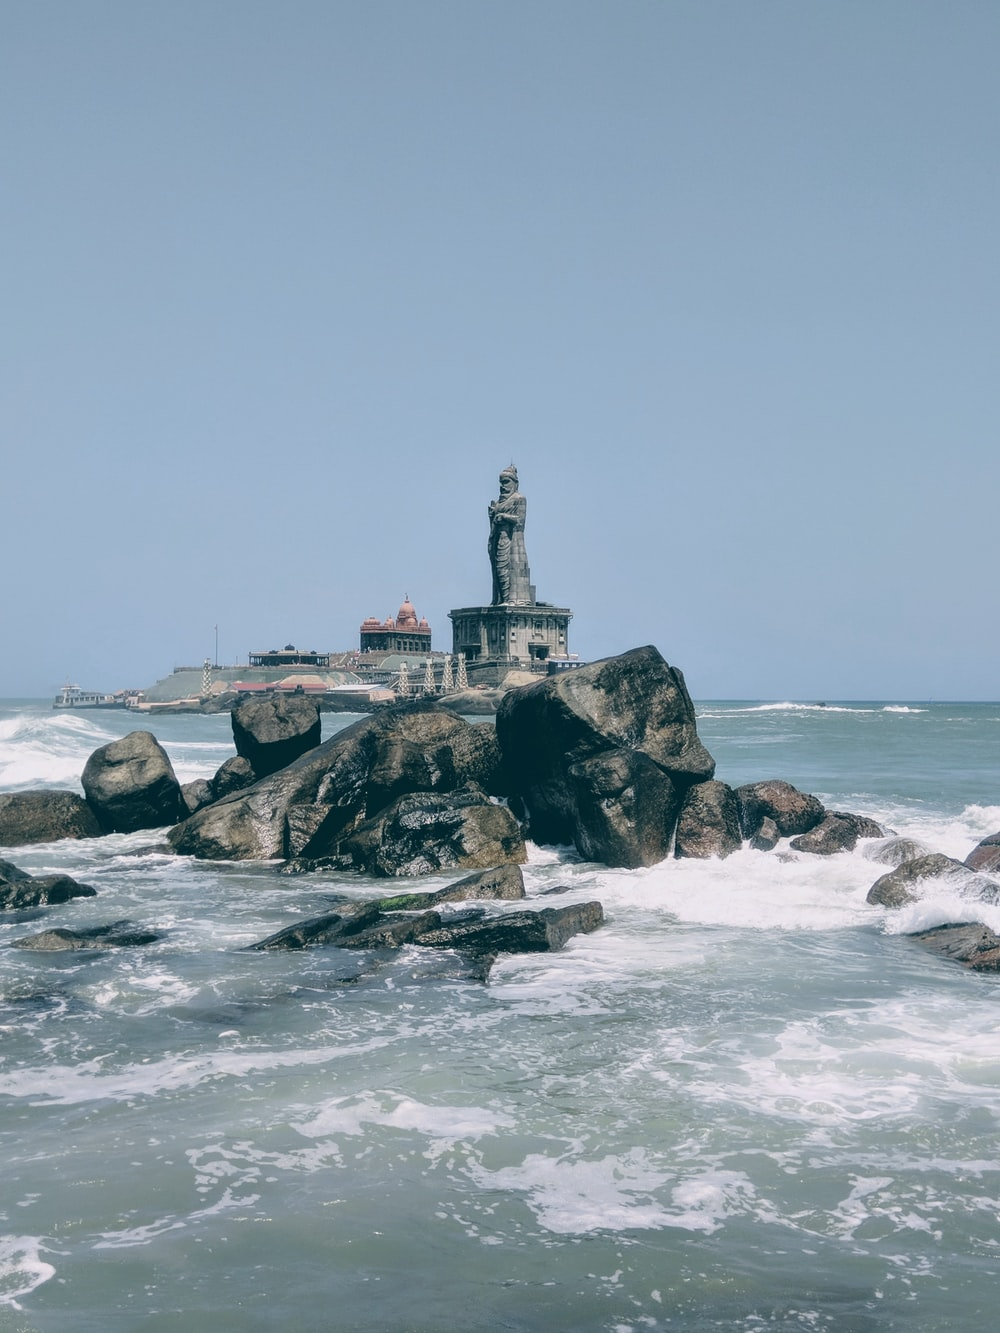 statue near ocean